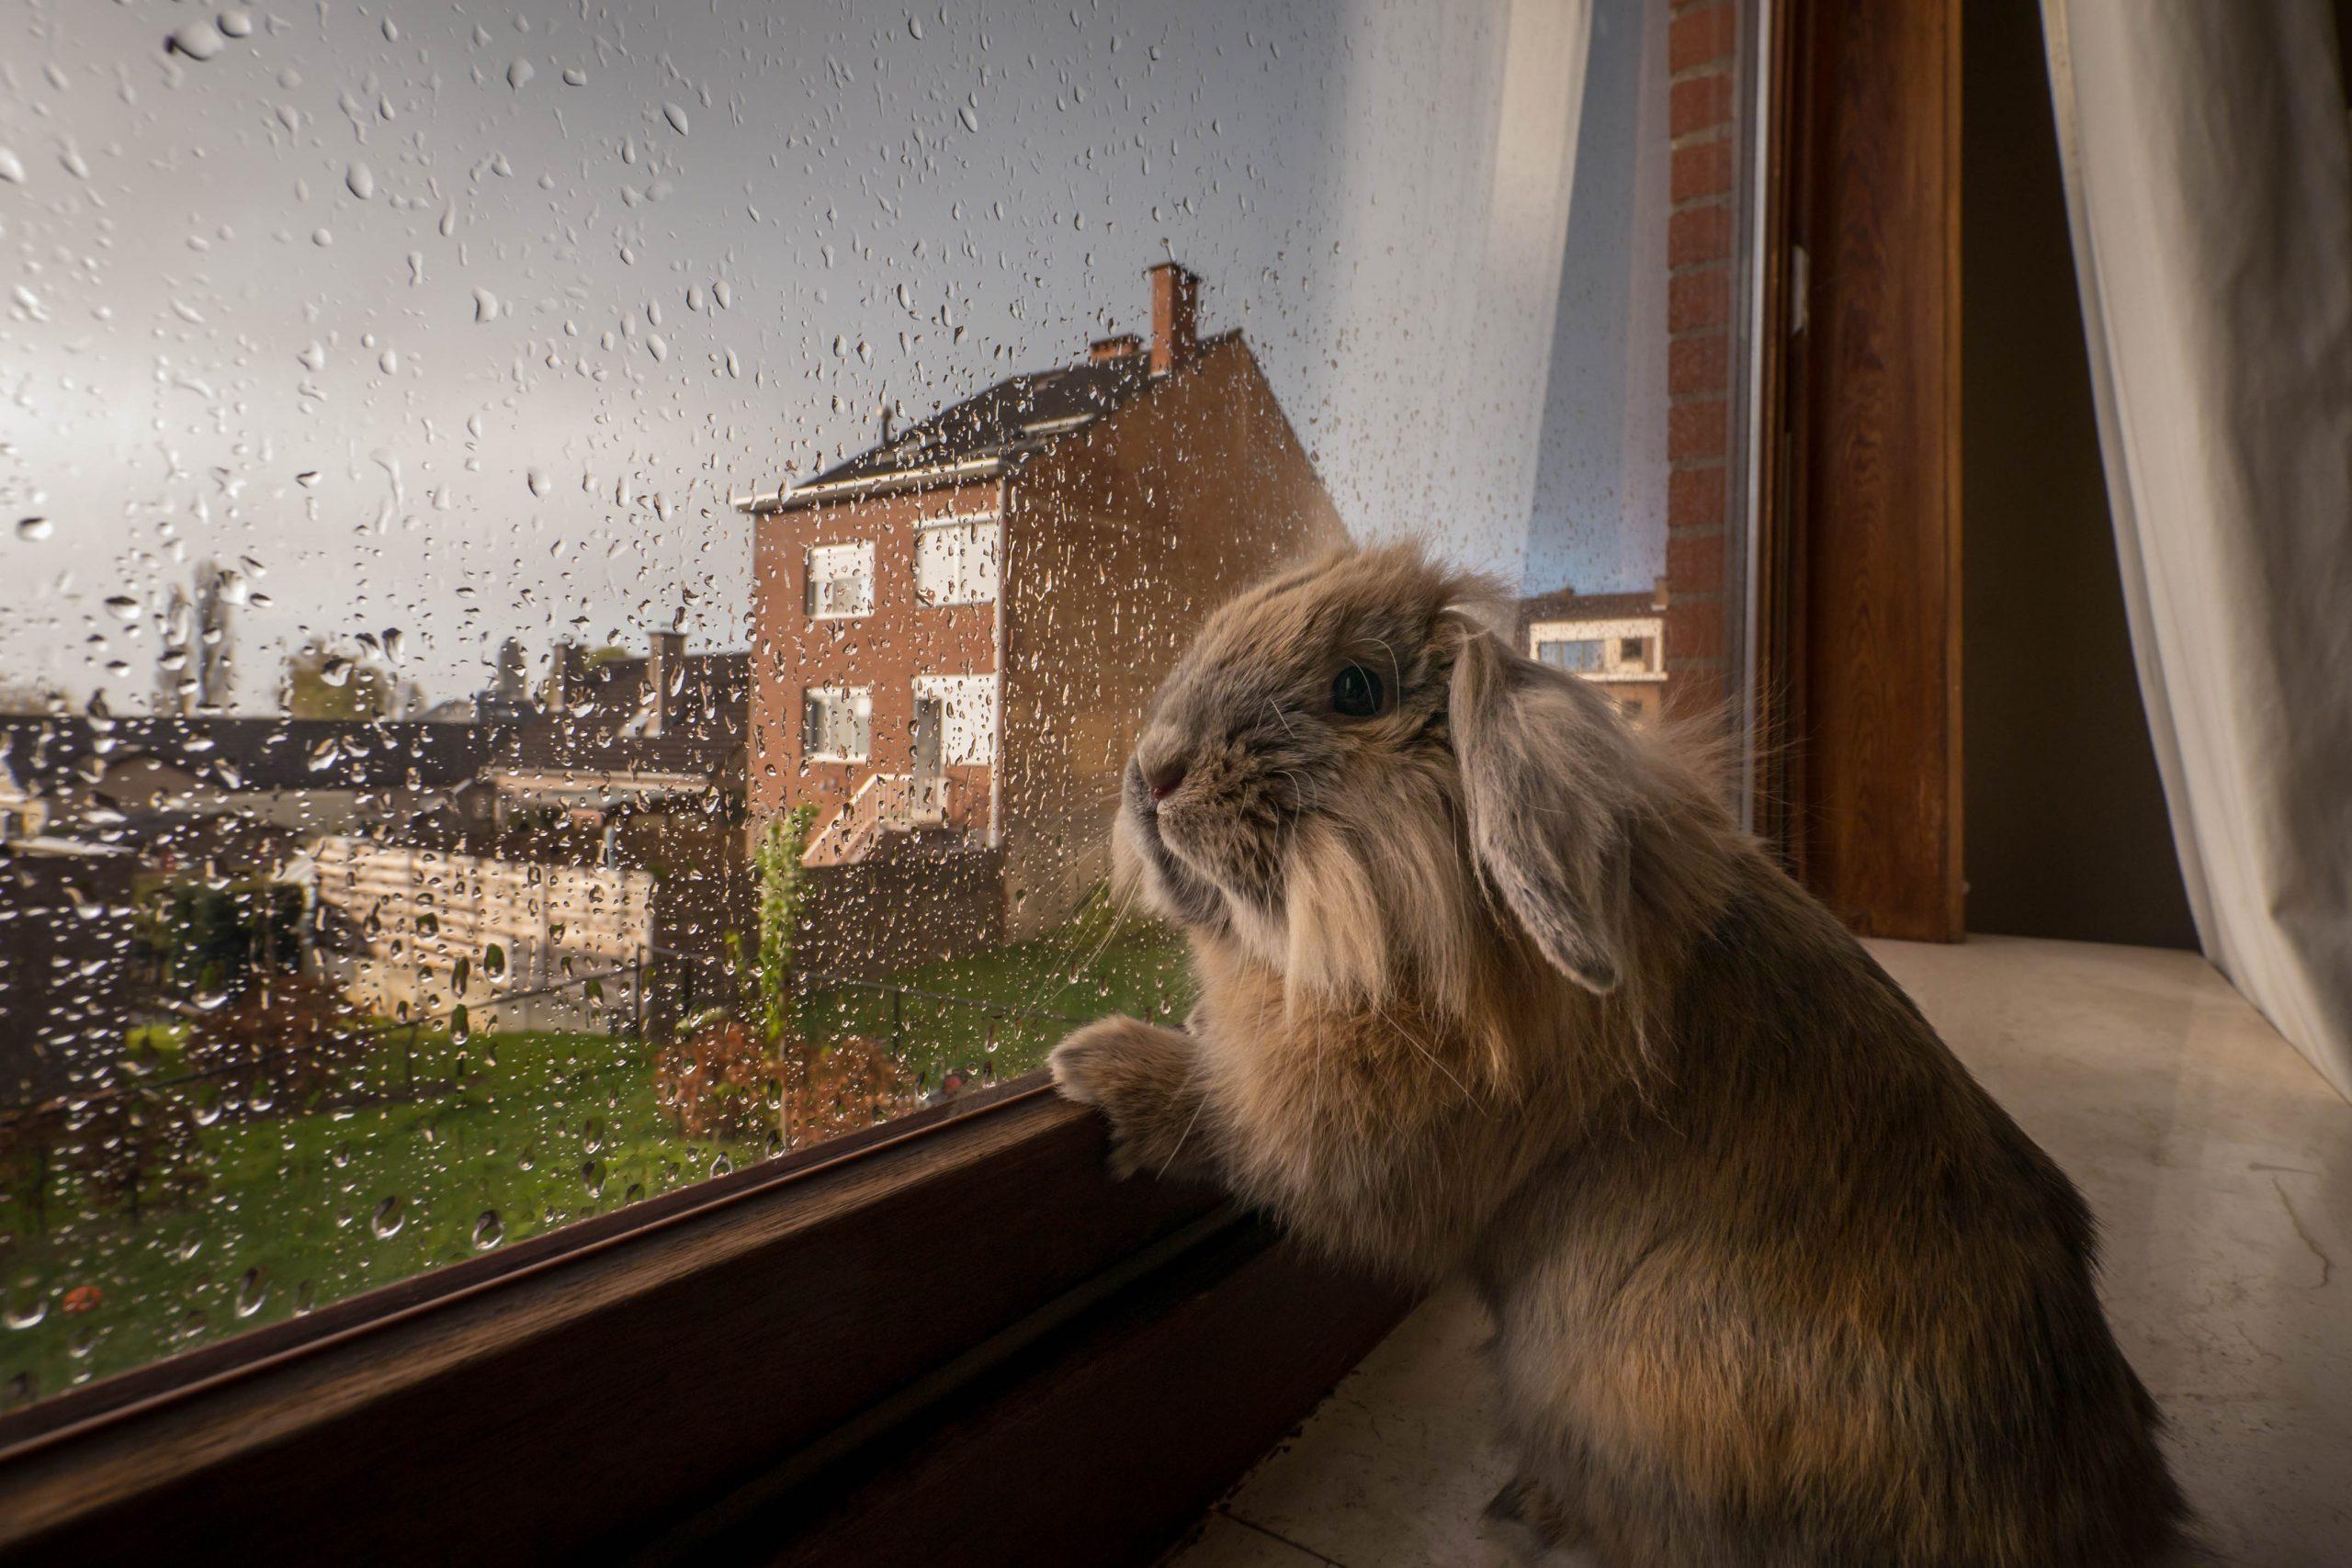 Rabbit looking through window pane in rain